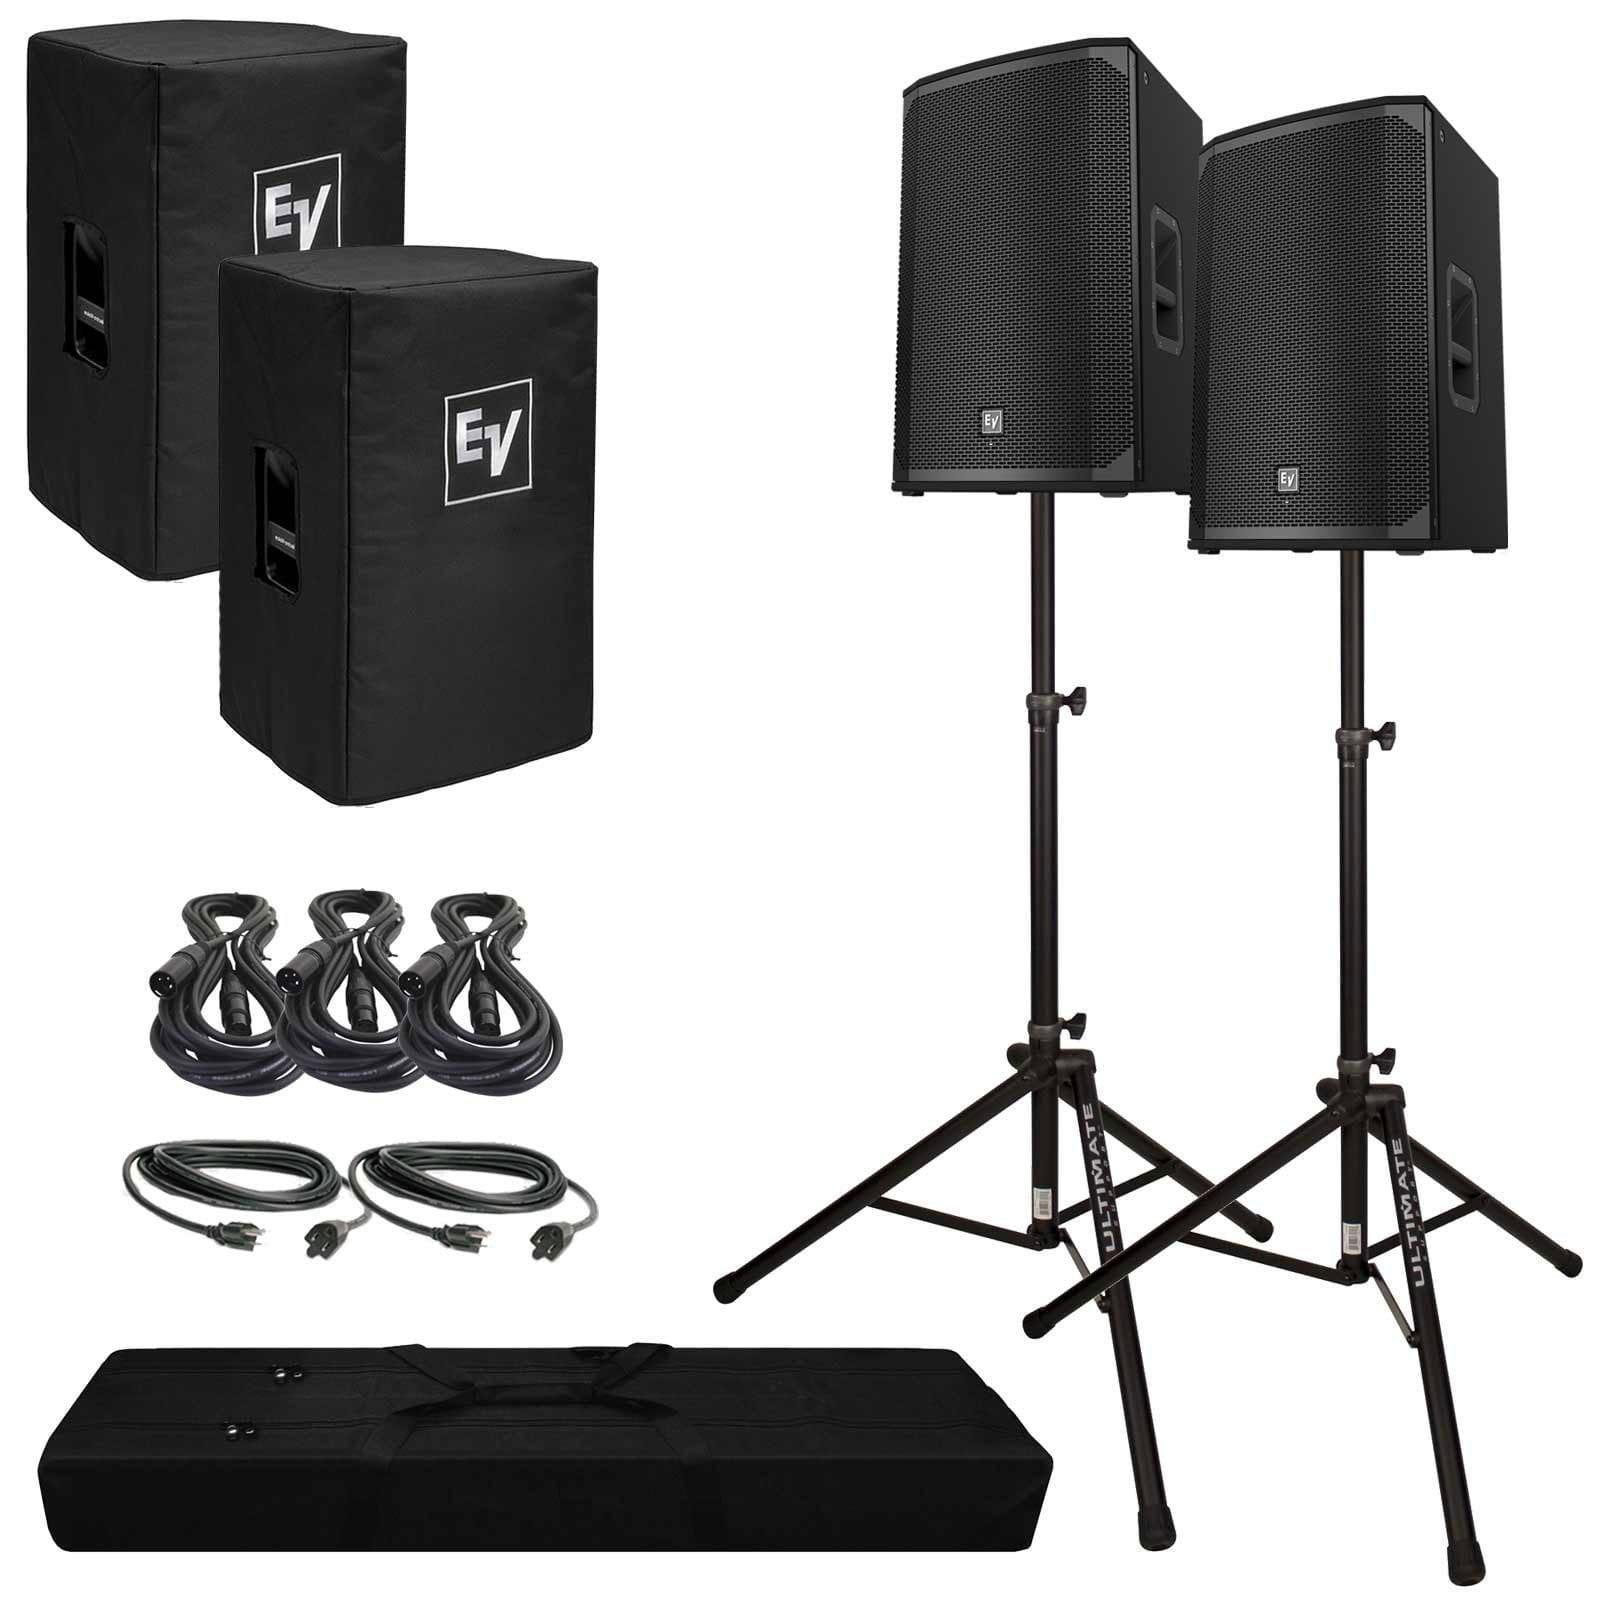 electro-voice-ekx-15p-15-powered-speaker-package-618